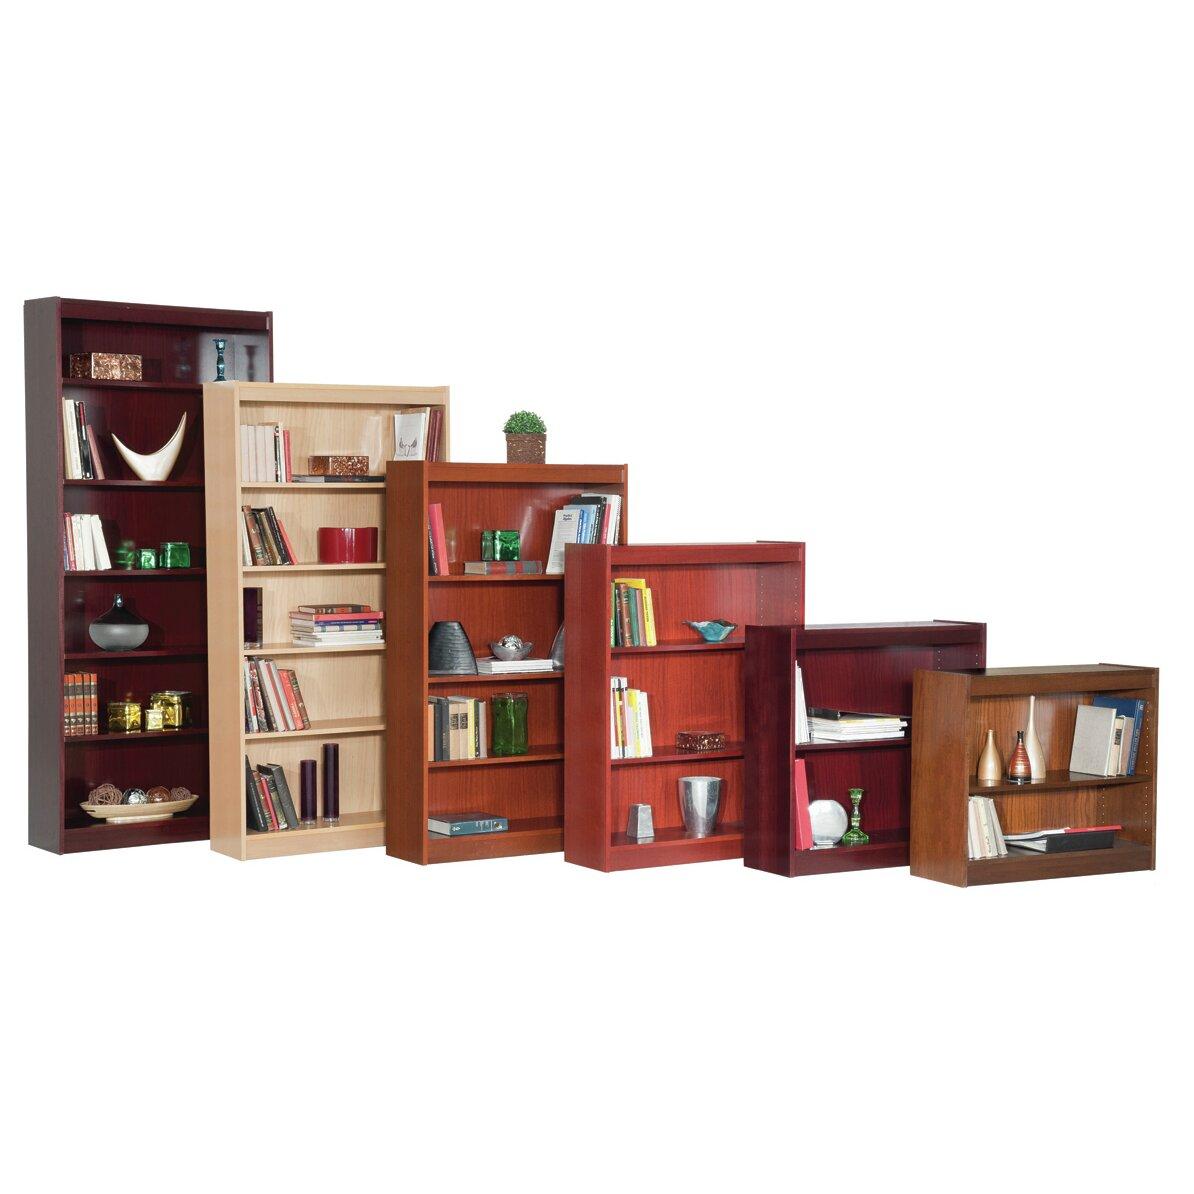 Norsons industries llc excalibur heavy duty shelf series for Abanos furniture industries decoration llc